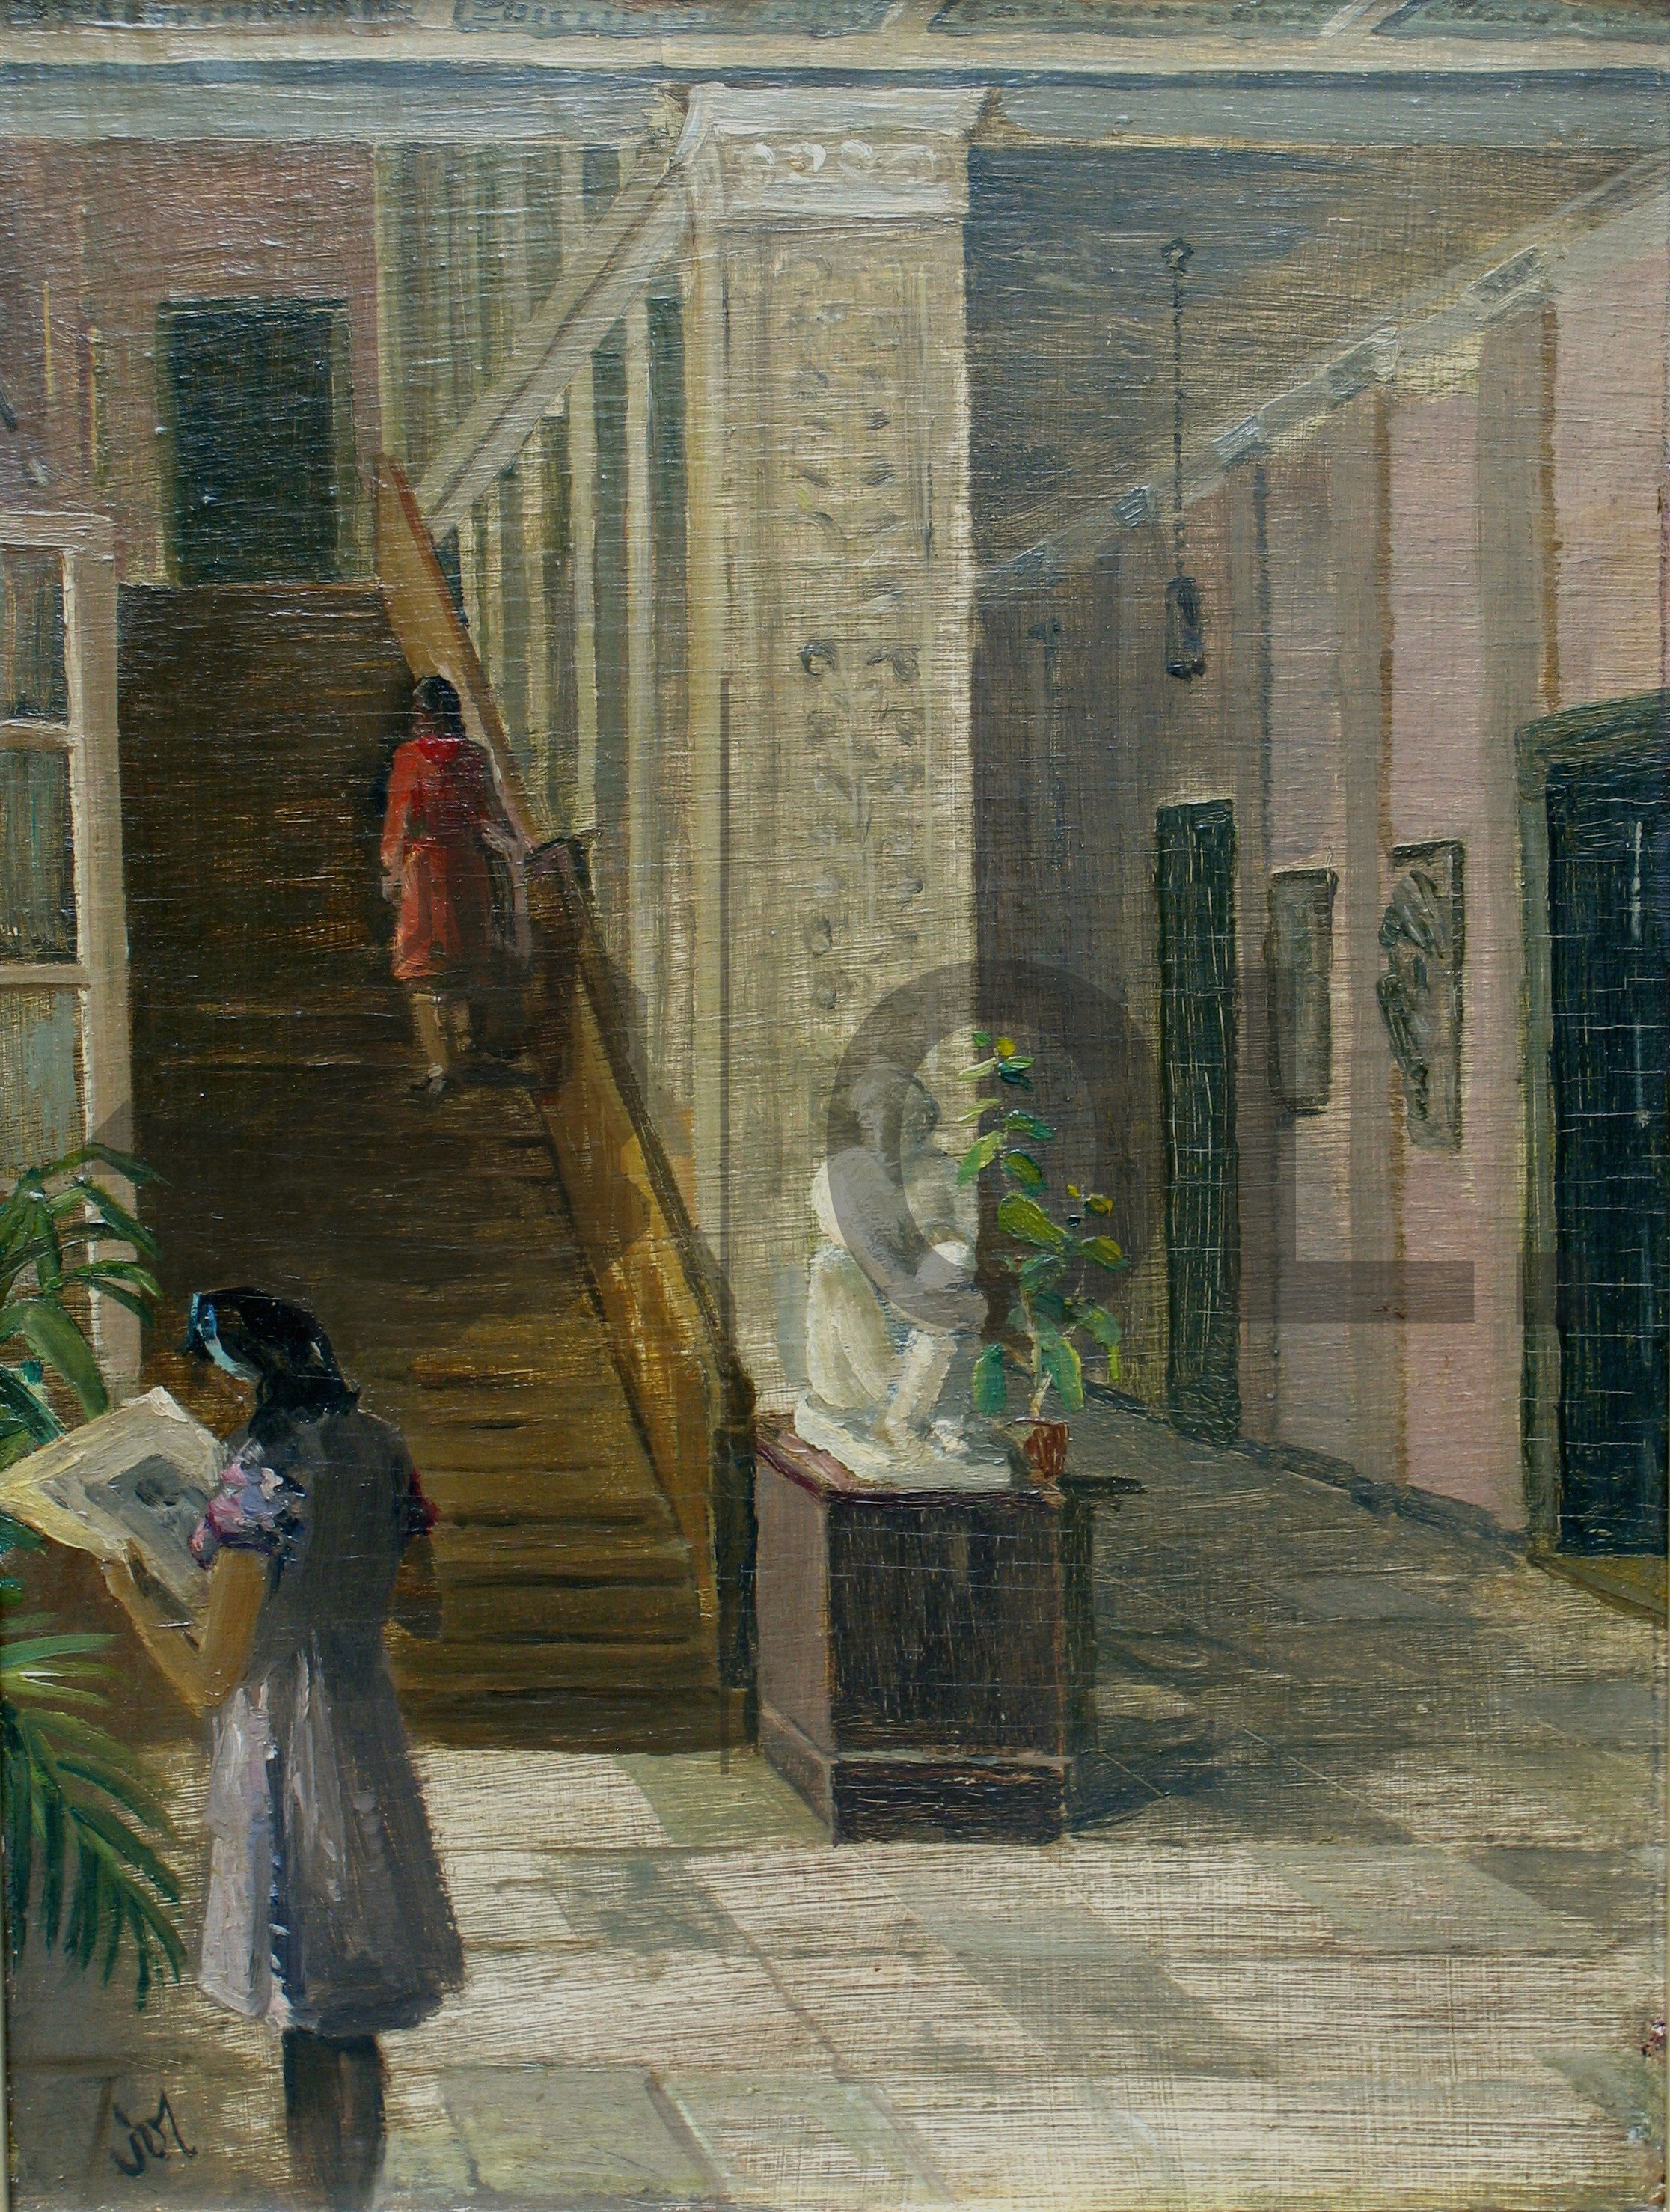 Objekt der Woche #31 – Blick in den Wandelgang der Königsberger Kunstakademie